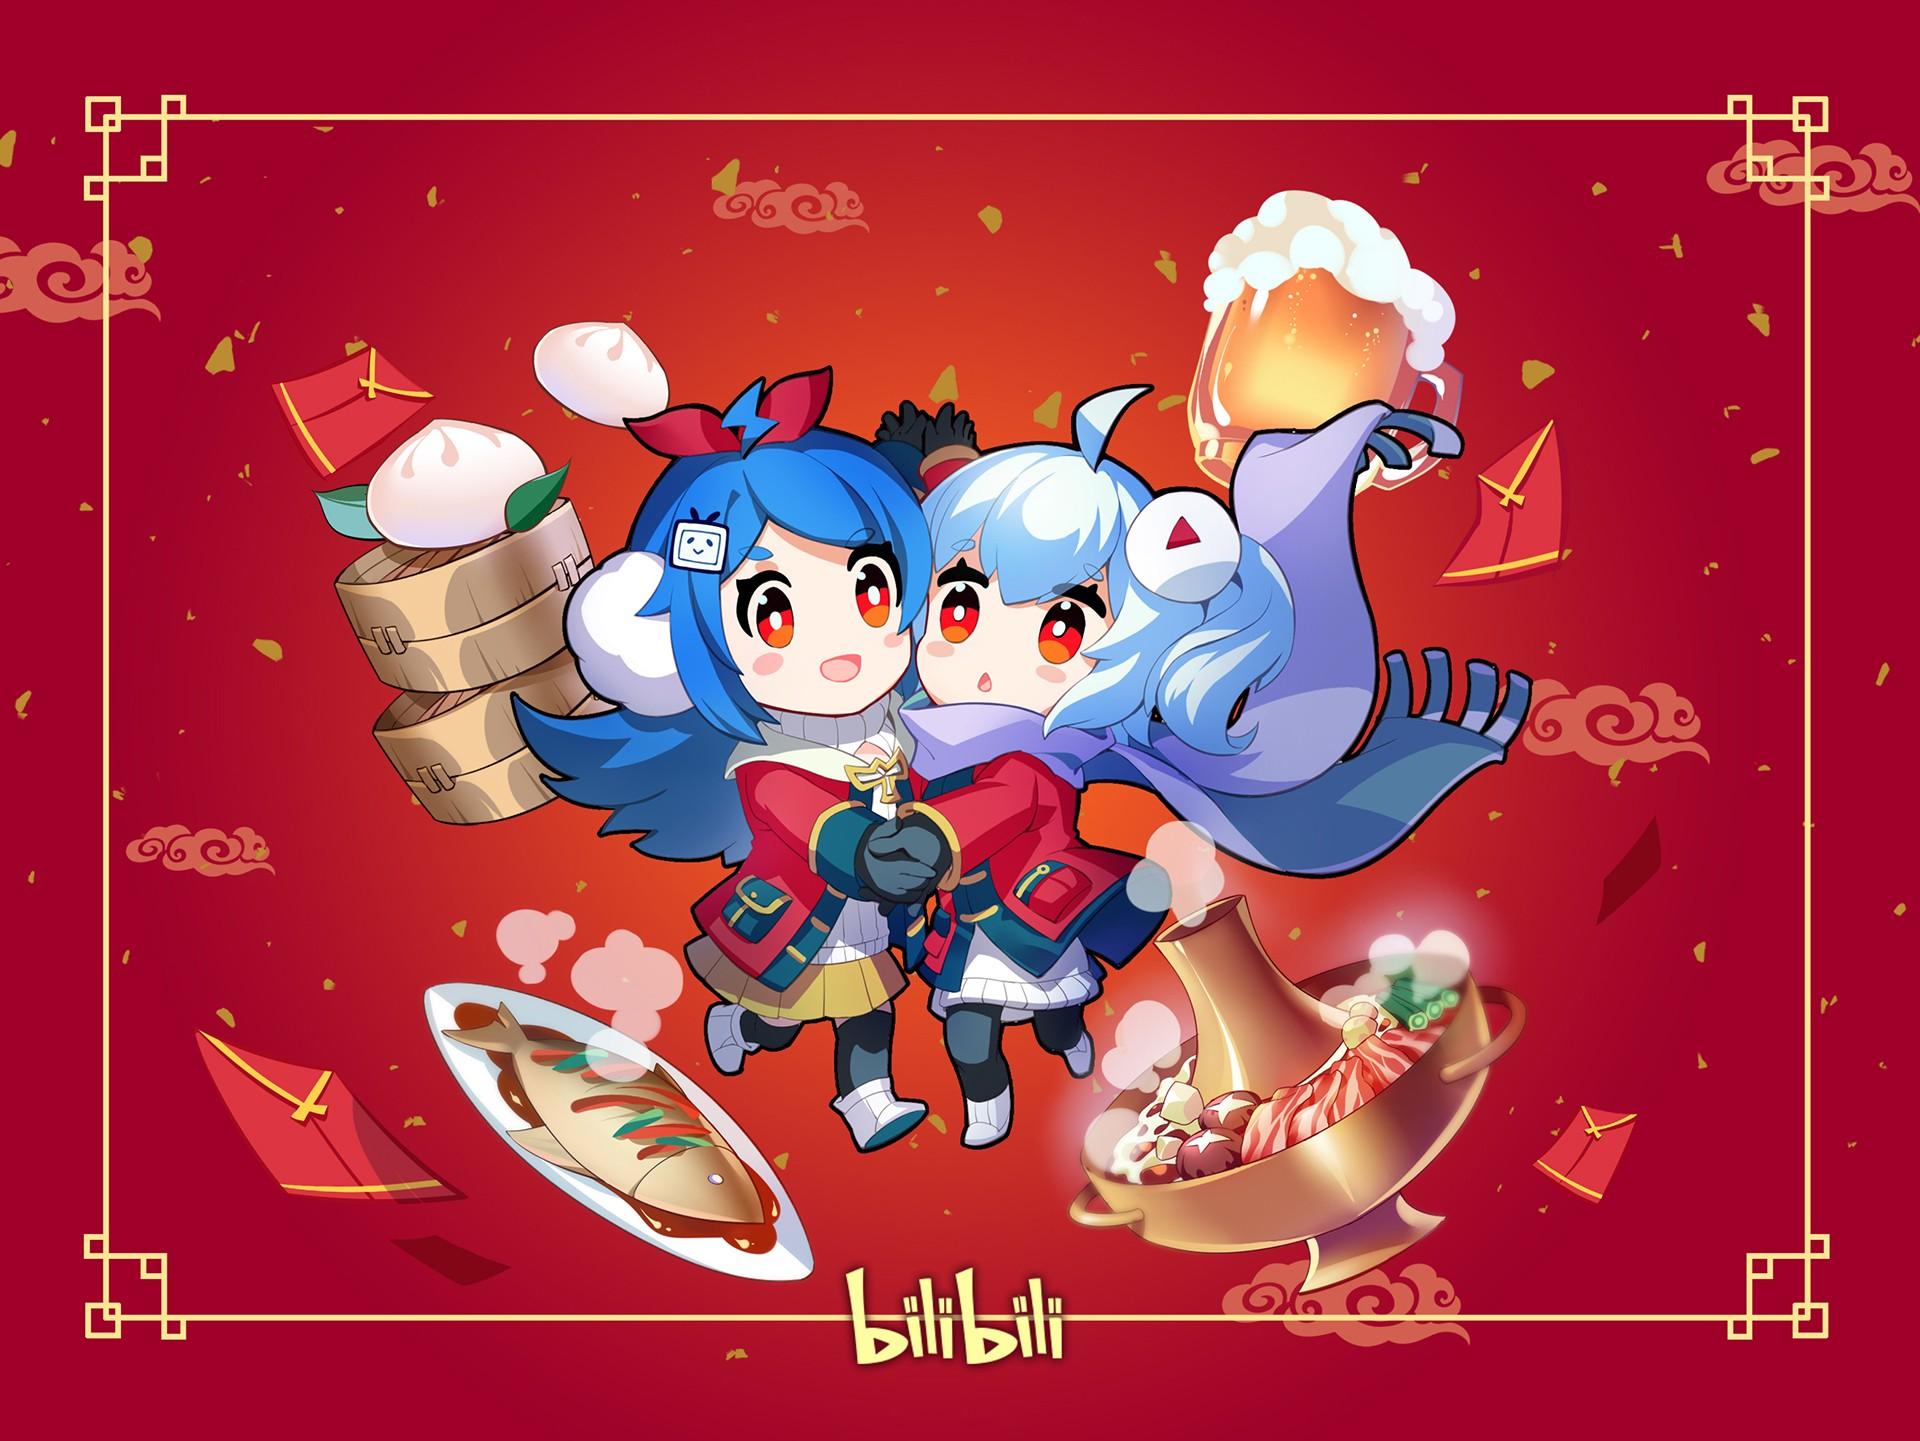 Illustration Cartoon Santa Claus Bilibili 2233 Spring Festival